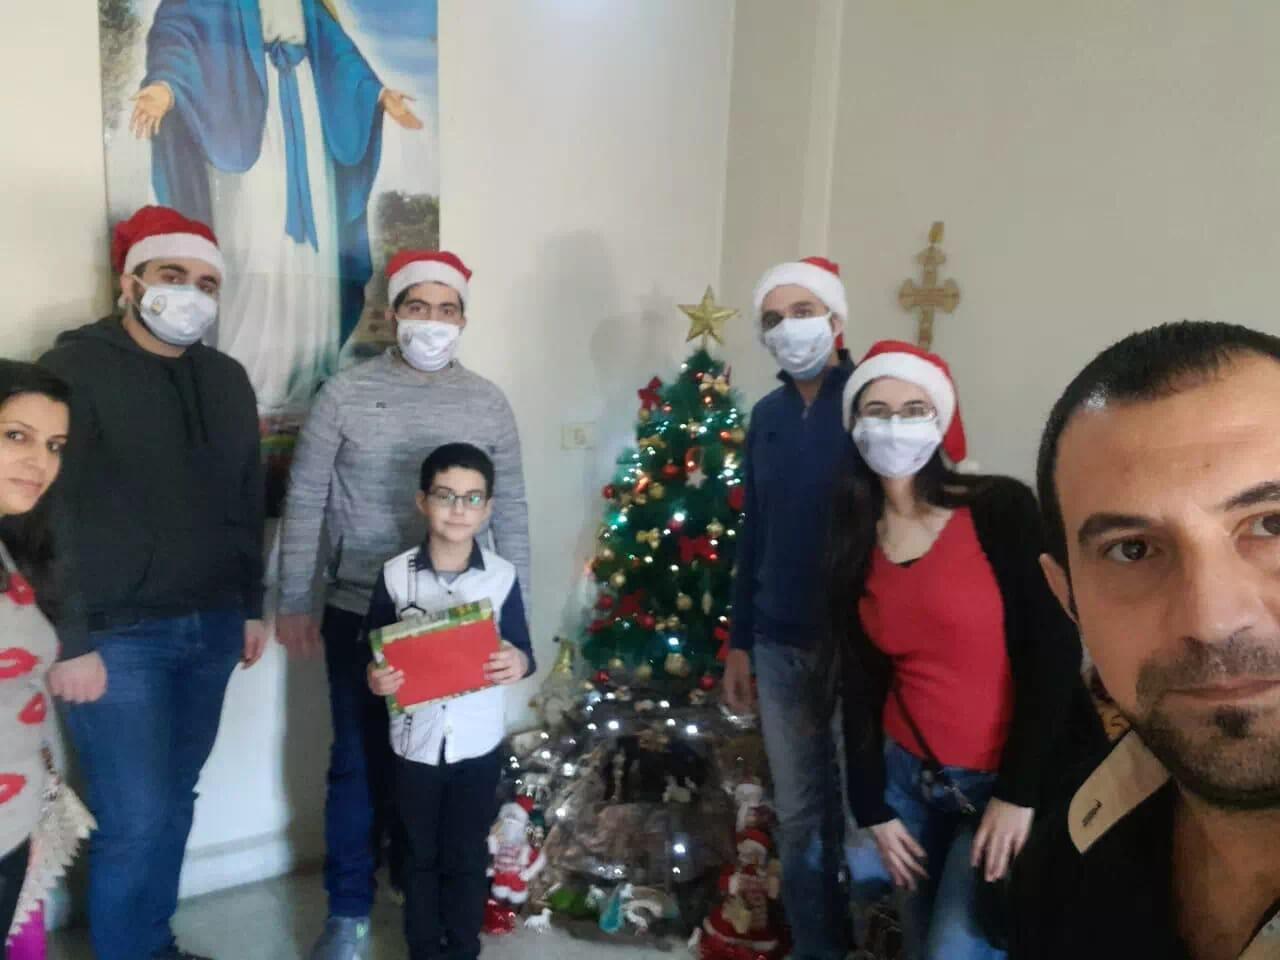 https://eundemia.sirv.com/Images/christmas/456800.webp